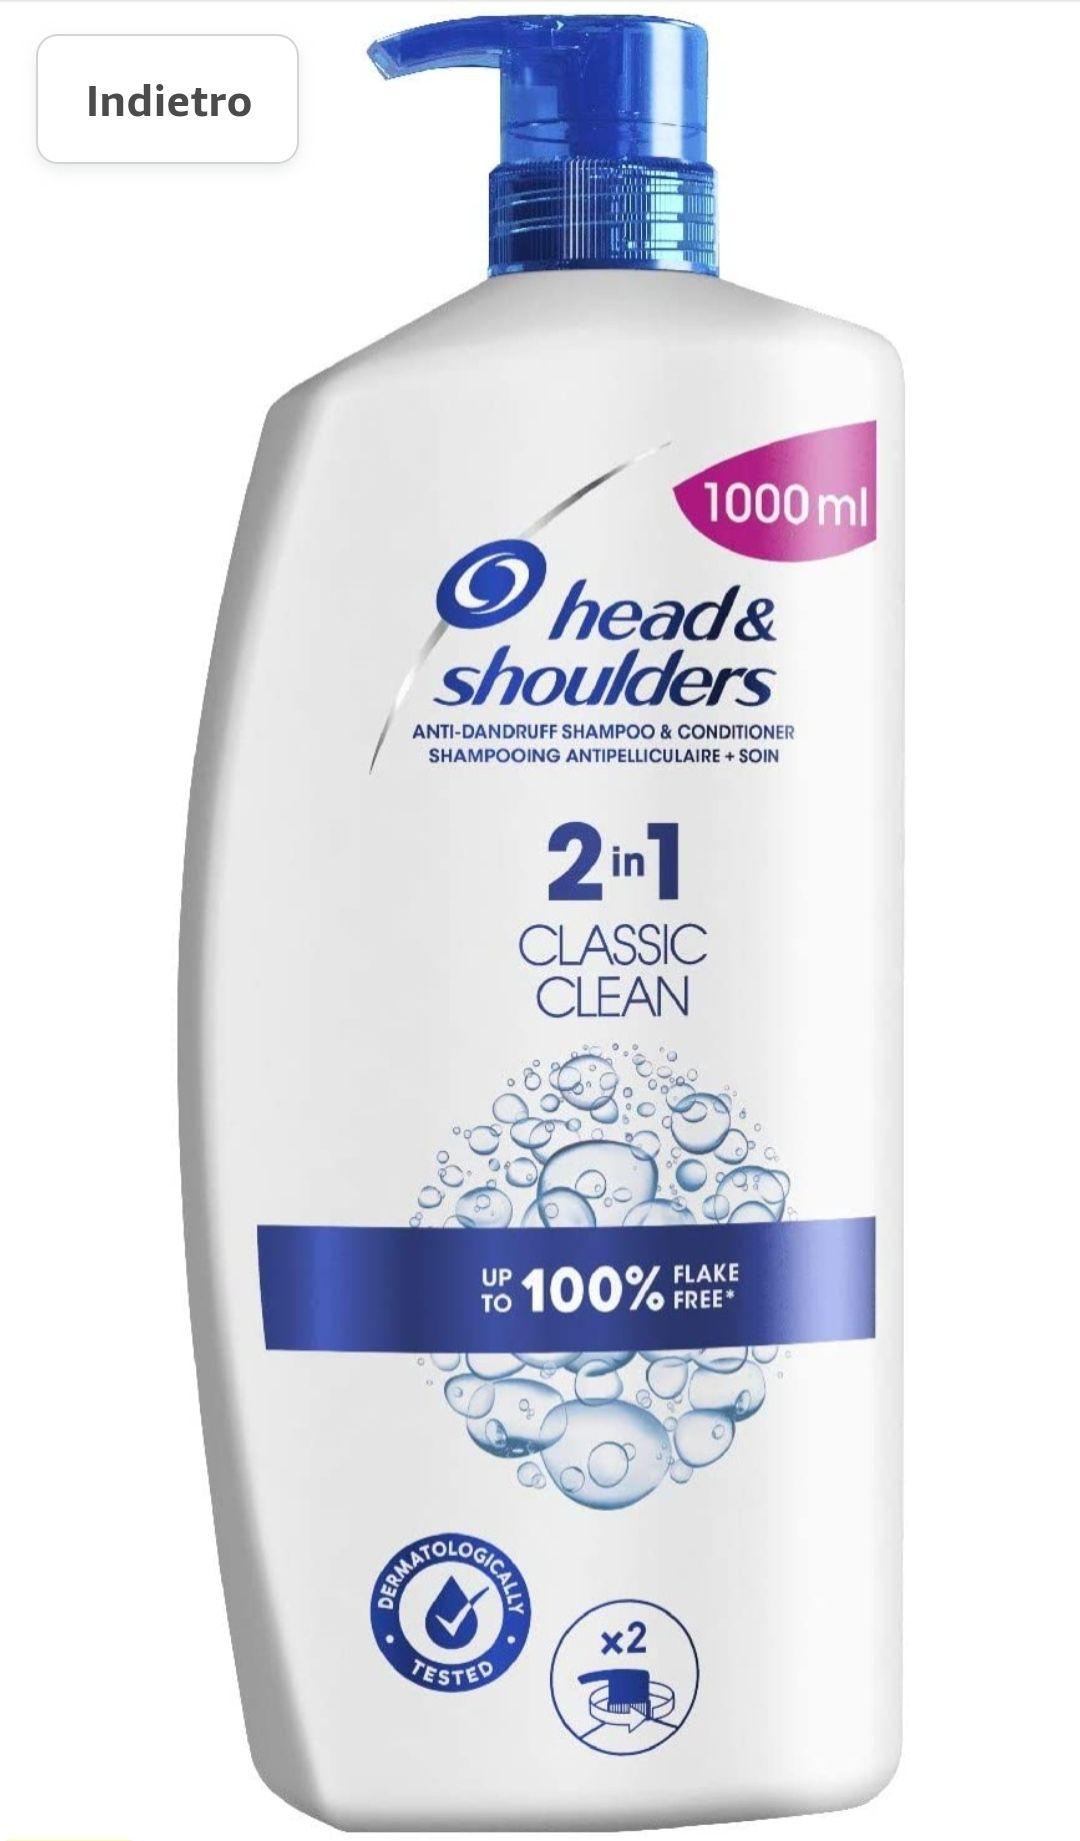 Head & Shoulders Classic Clean 2in1 Antiforfora Shampoo E Balsamo Per Capelli, 1000 ml